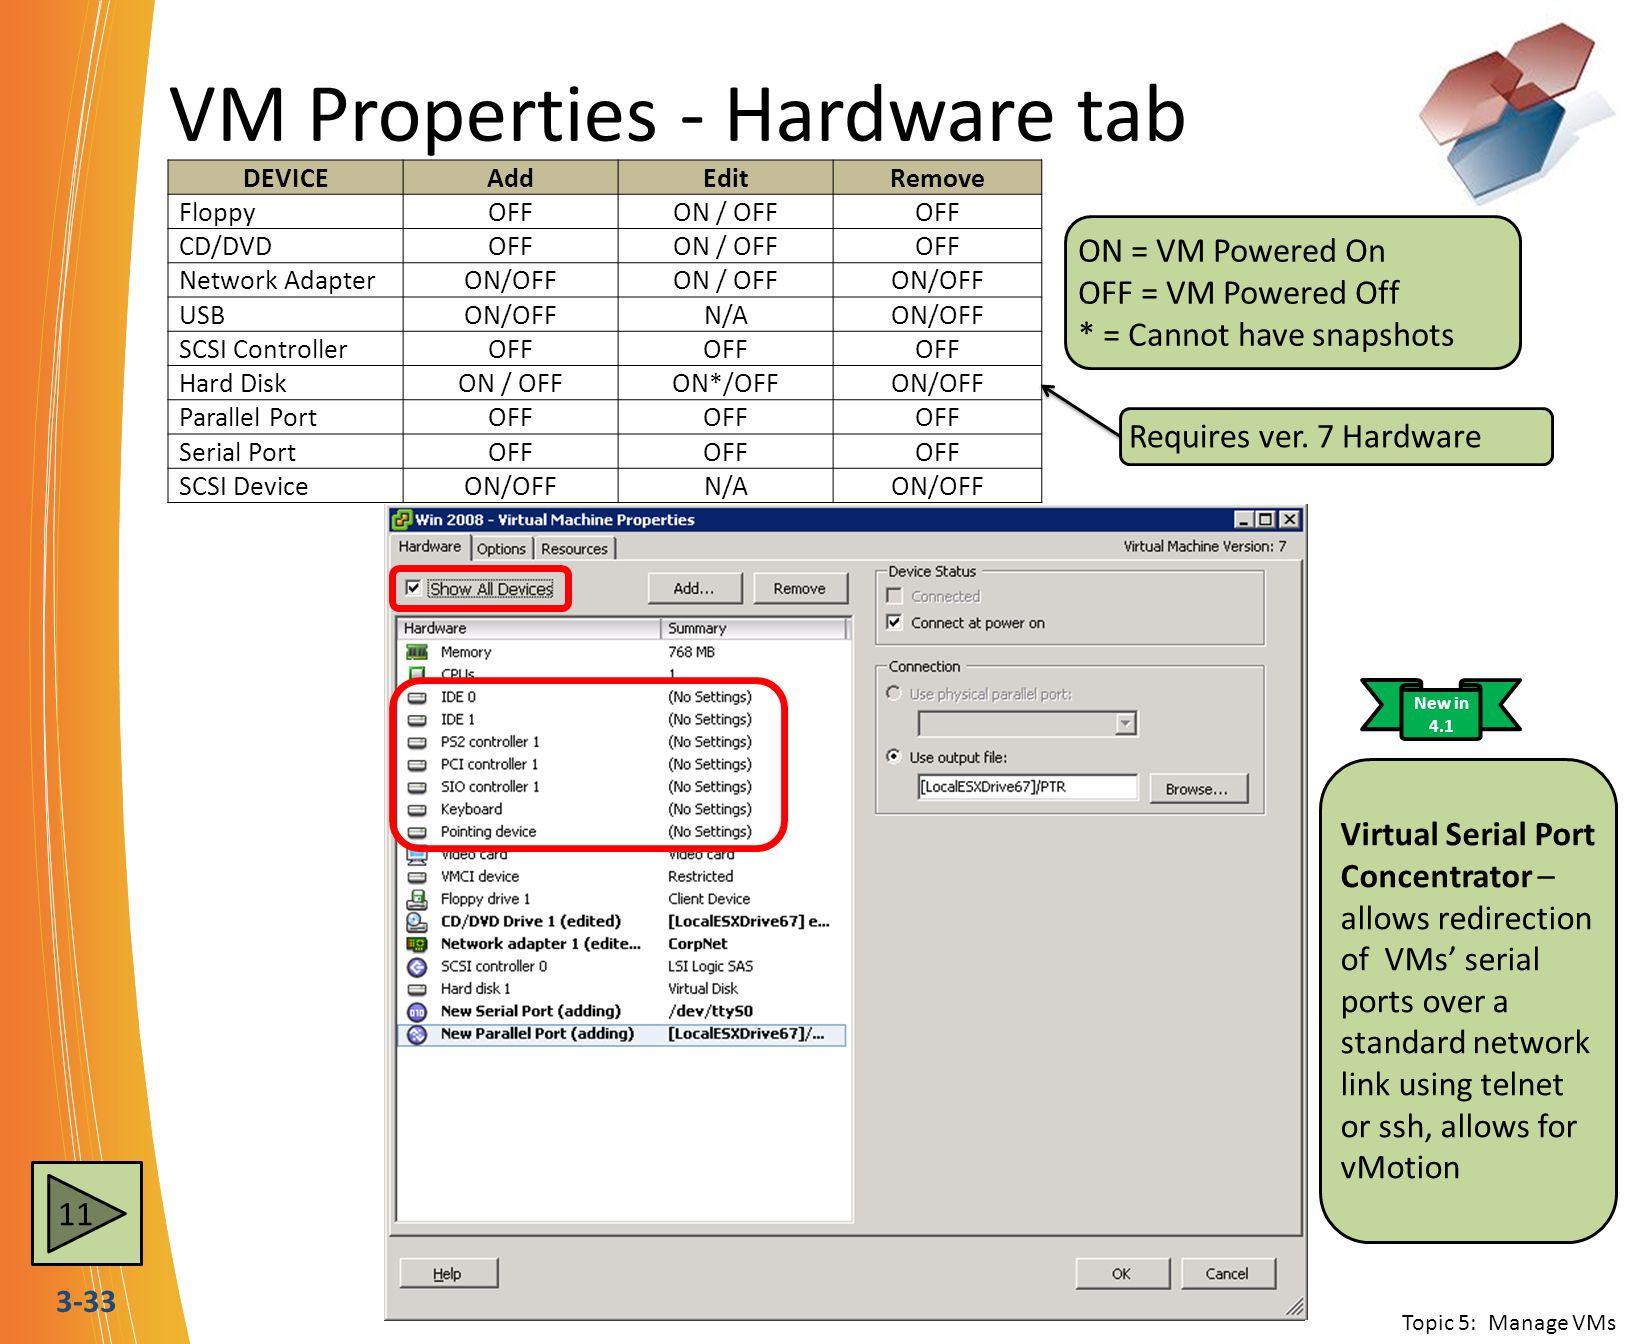 VM Properties - Hardware tab